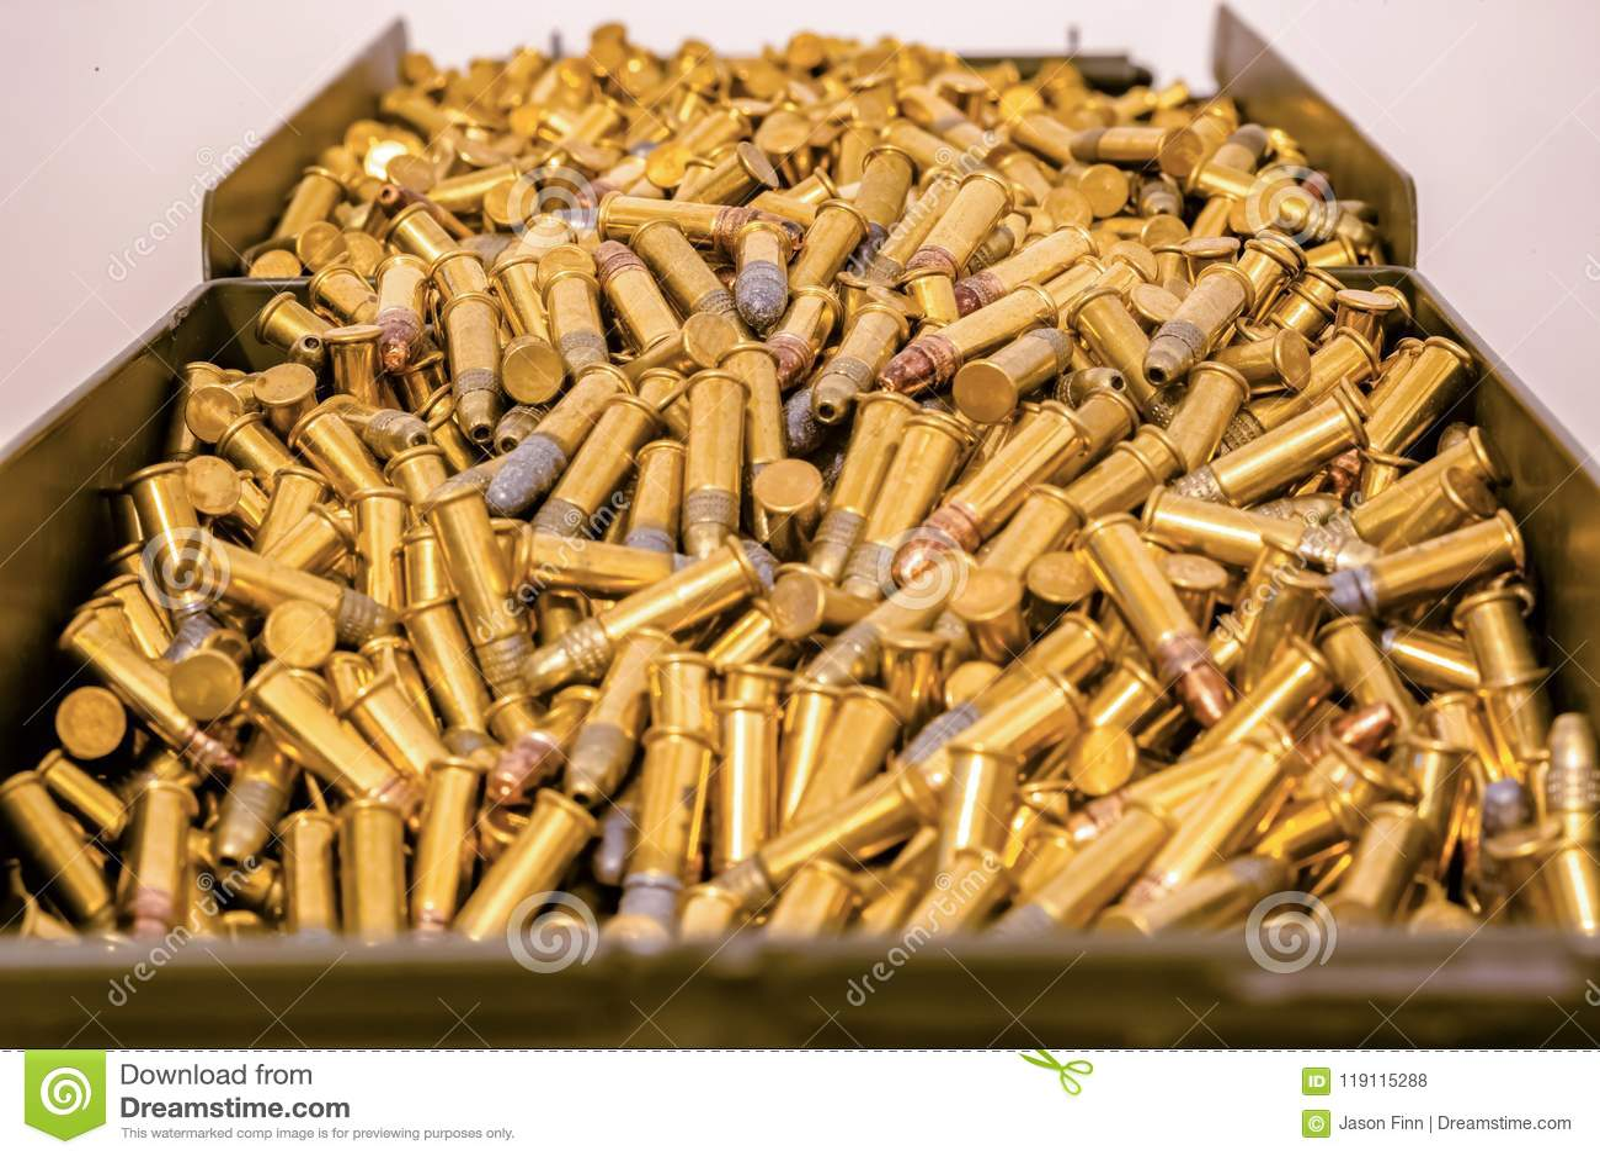 Großer Munitionskasten voll Kugeln